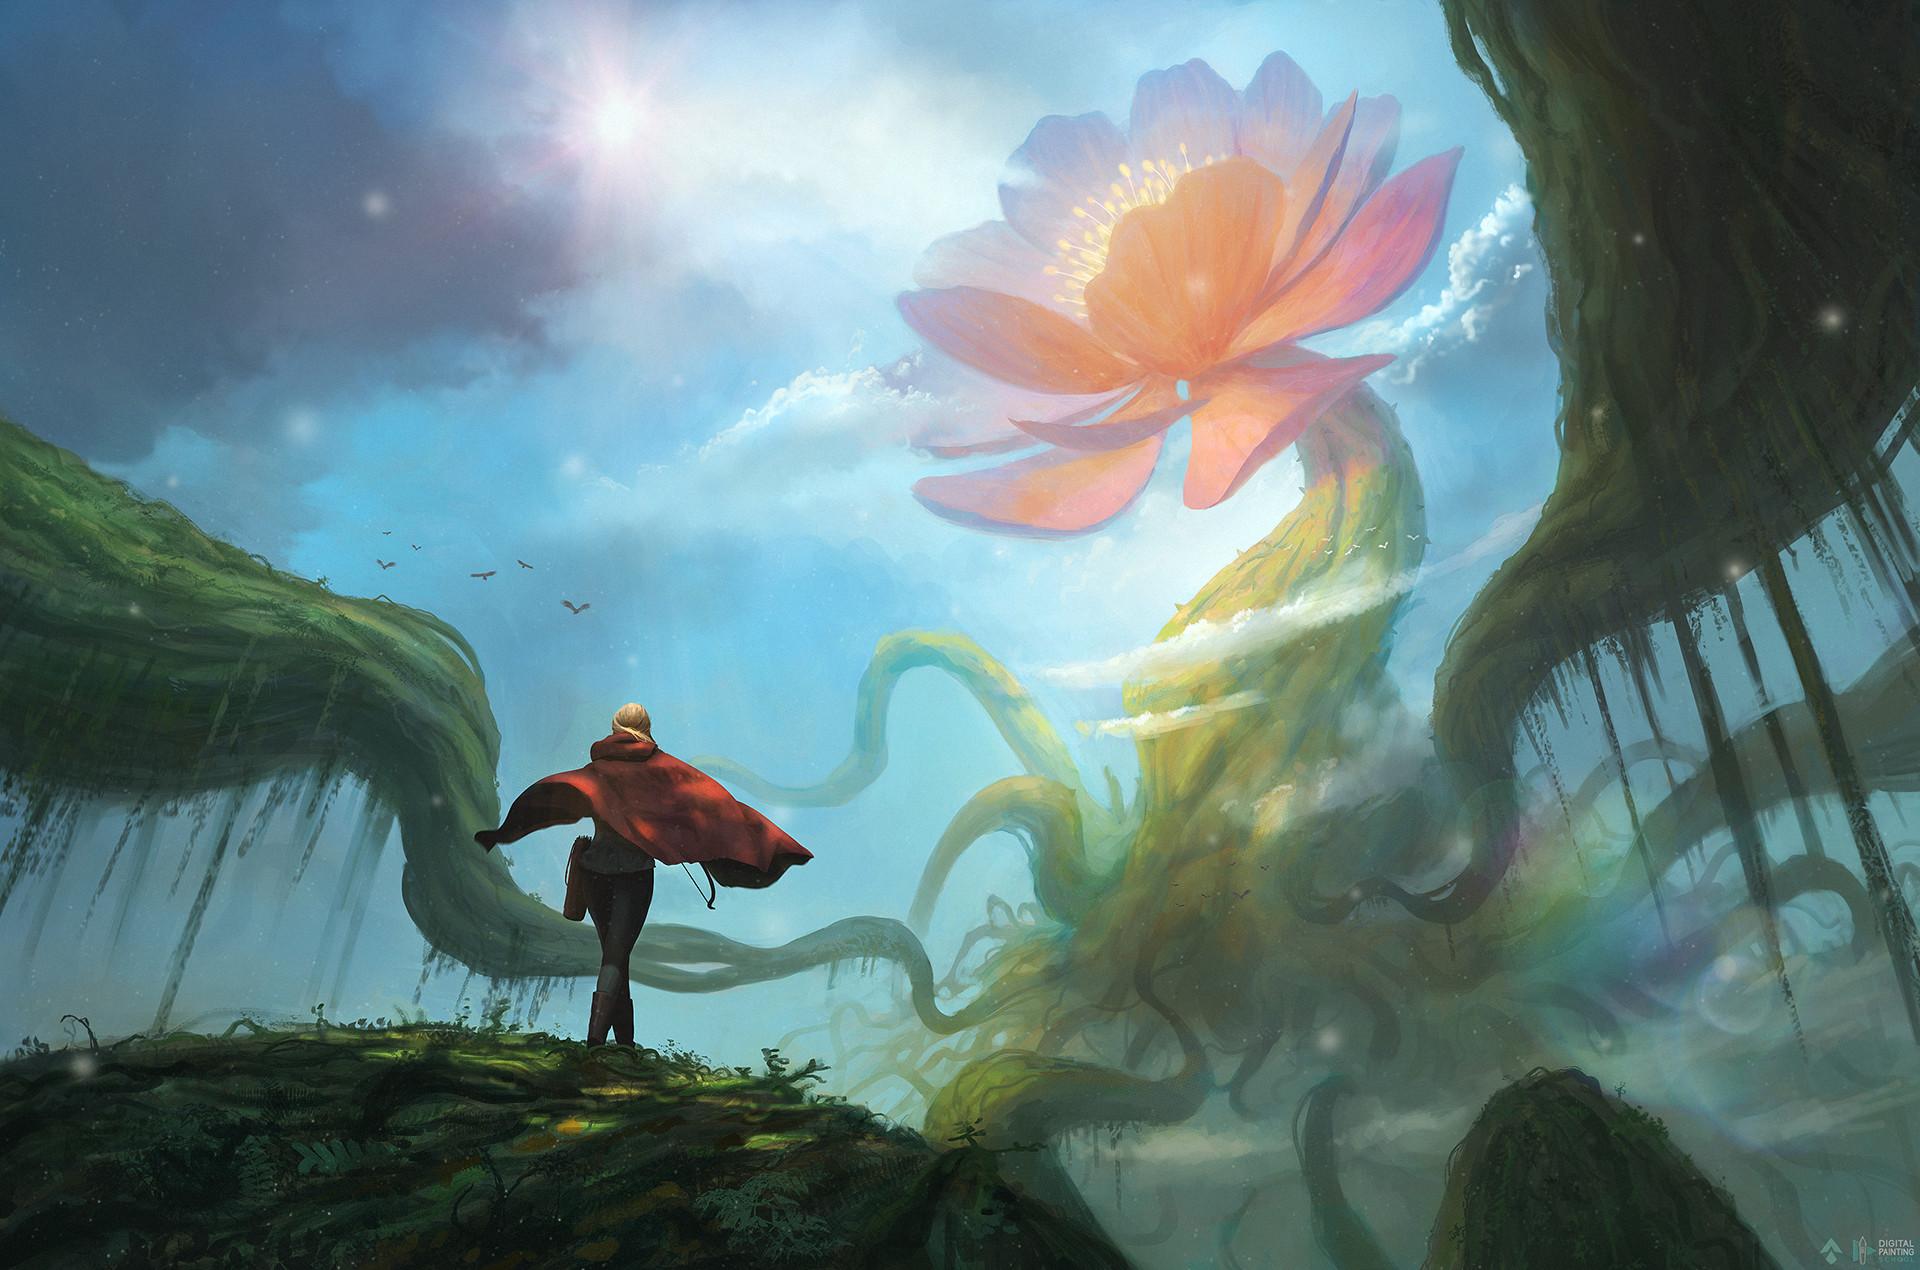 Gaetan weltzer dps prog 1 10 ex5 environnement fantasy etape5 final2 s